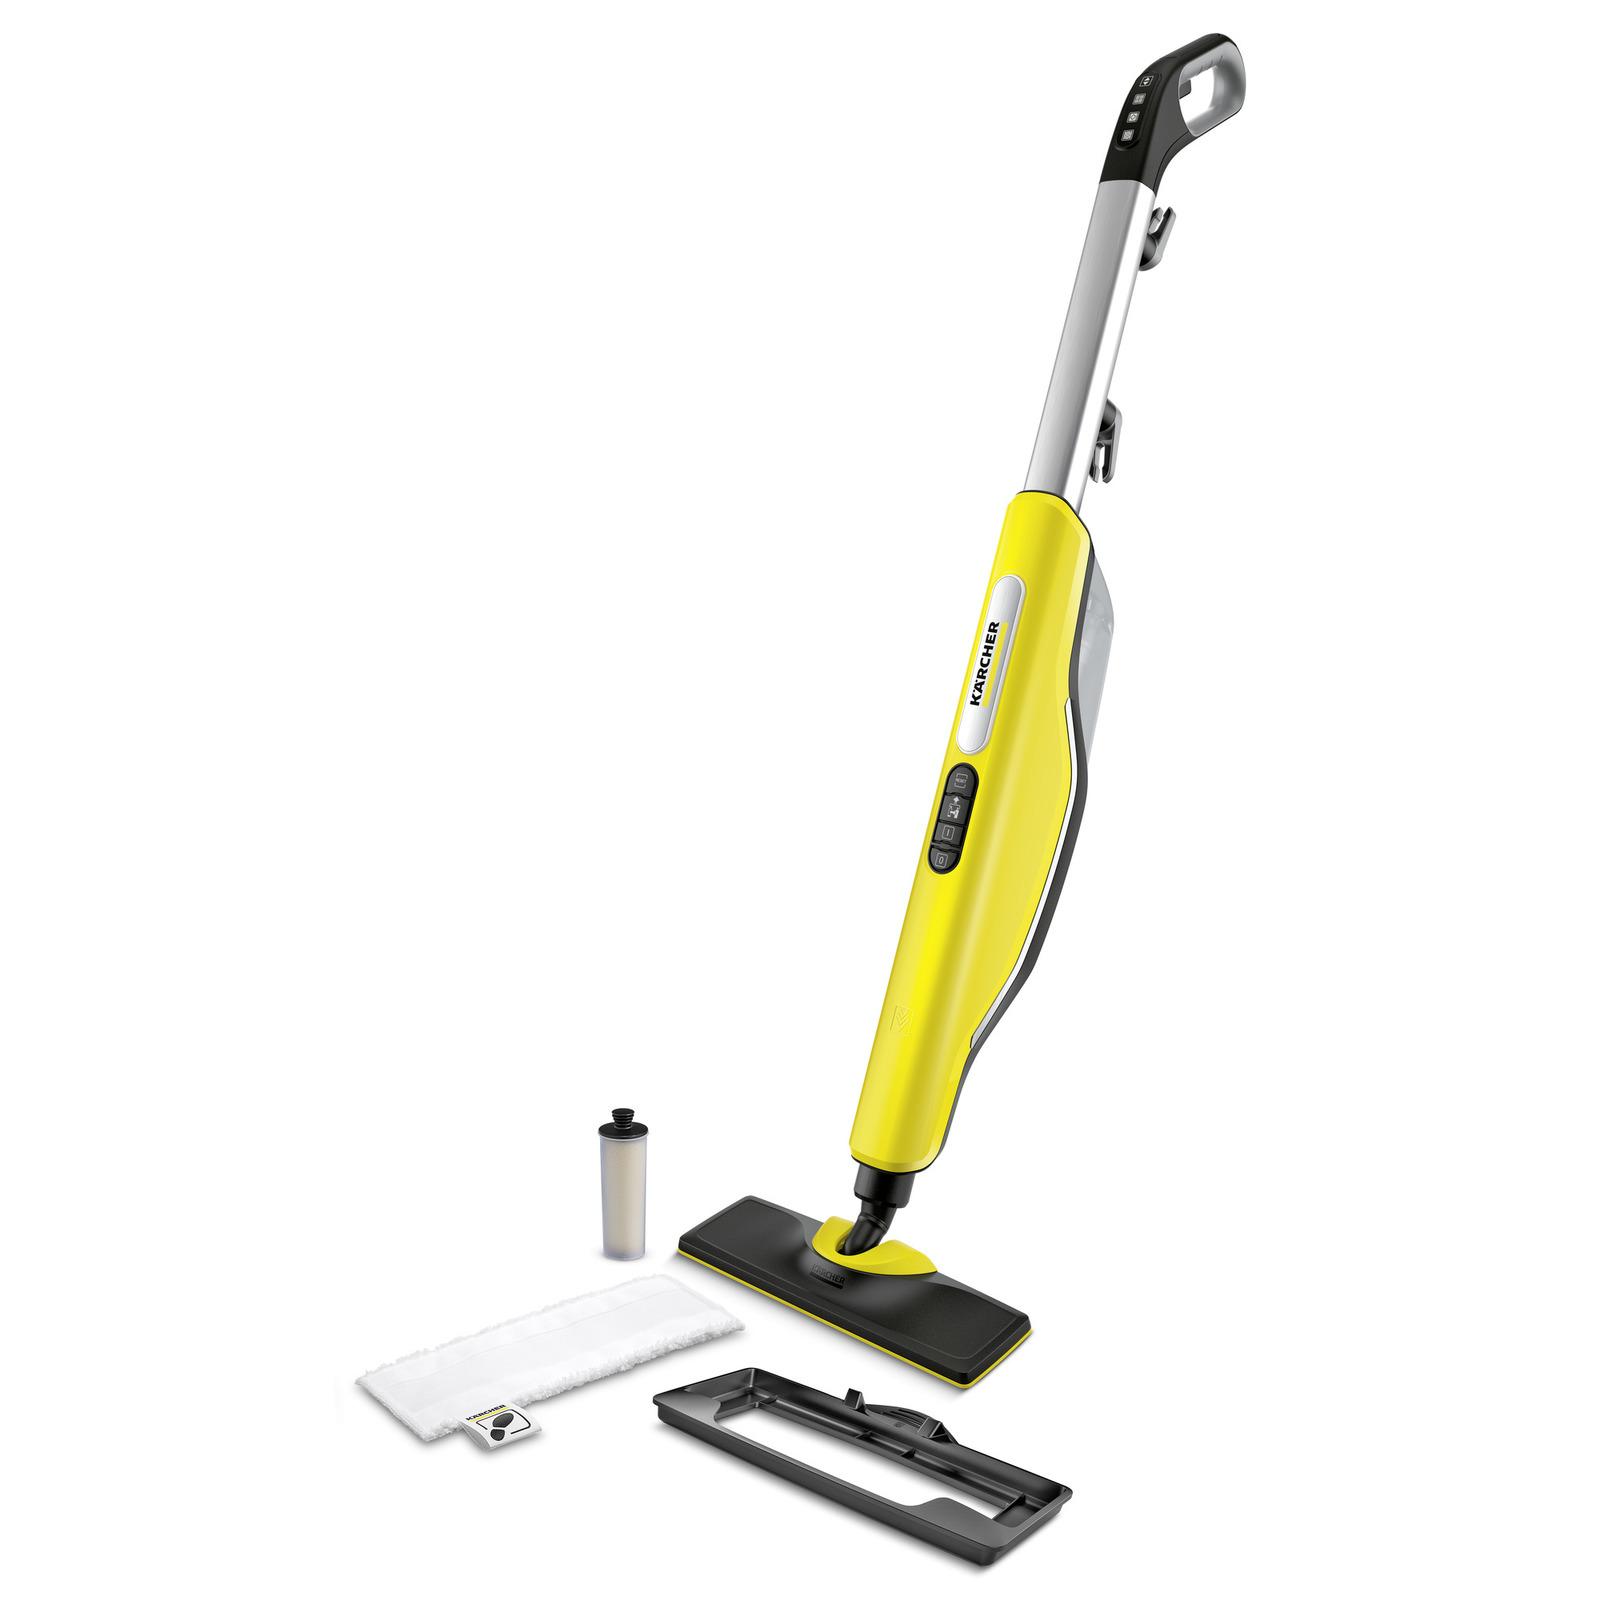 KARCHER 1.513-301.0 - SC3 Upright EasyFix Steam Cleaner